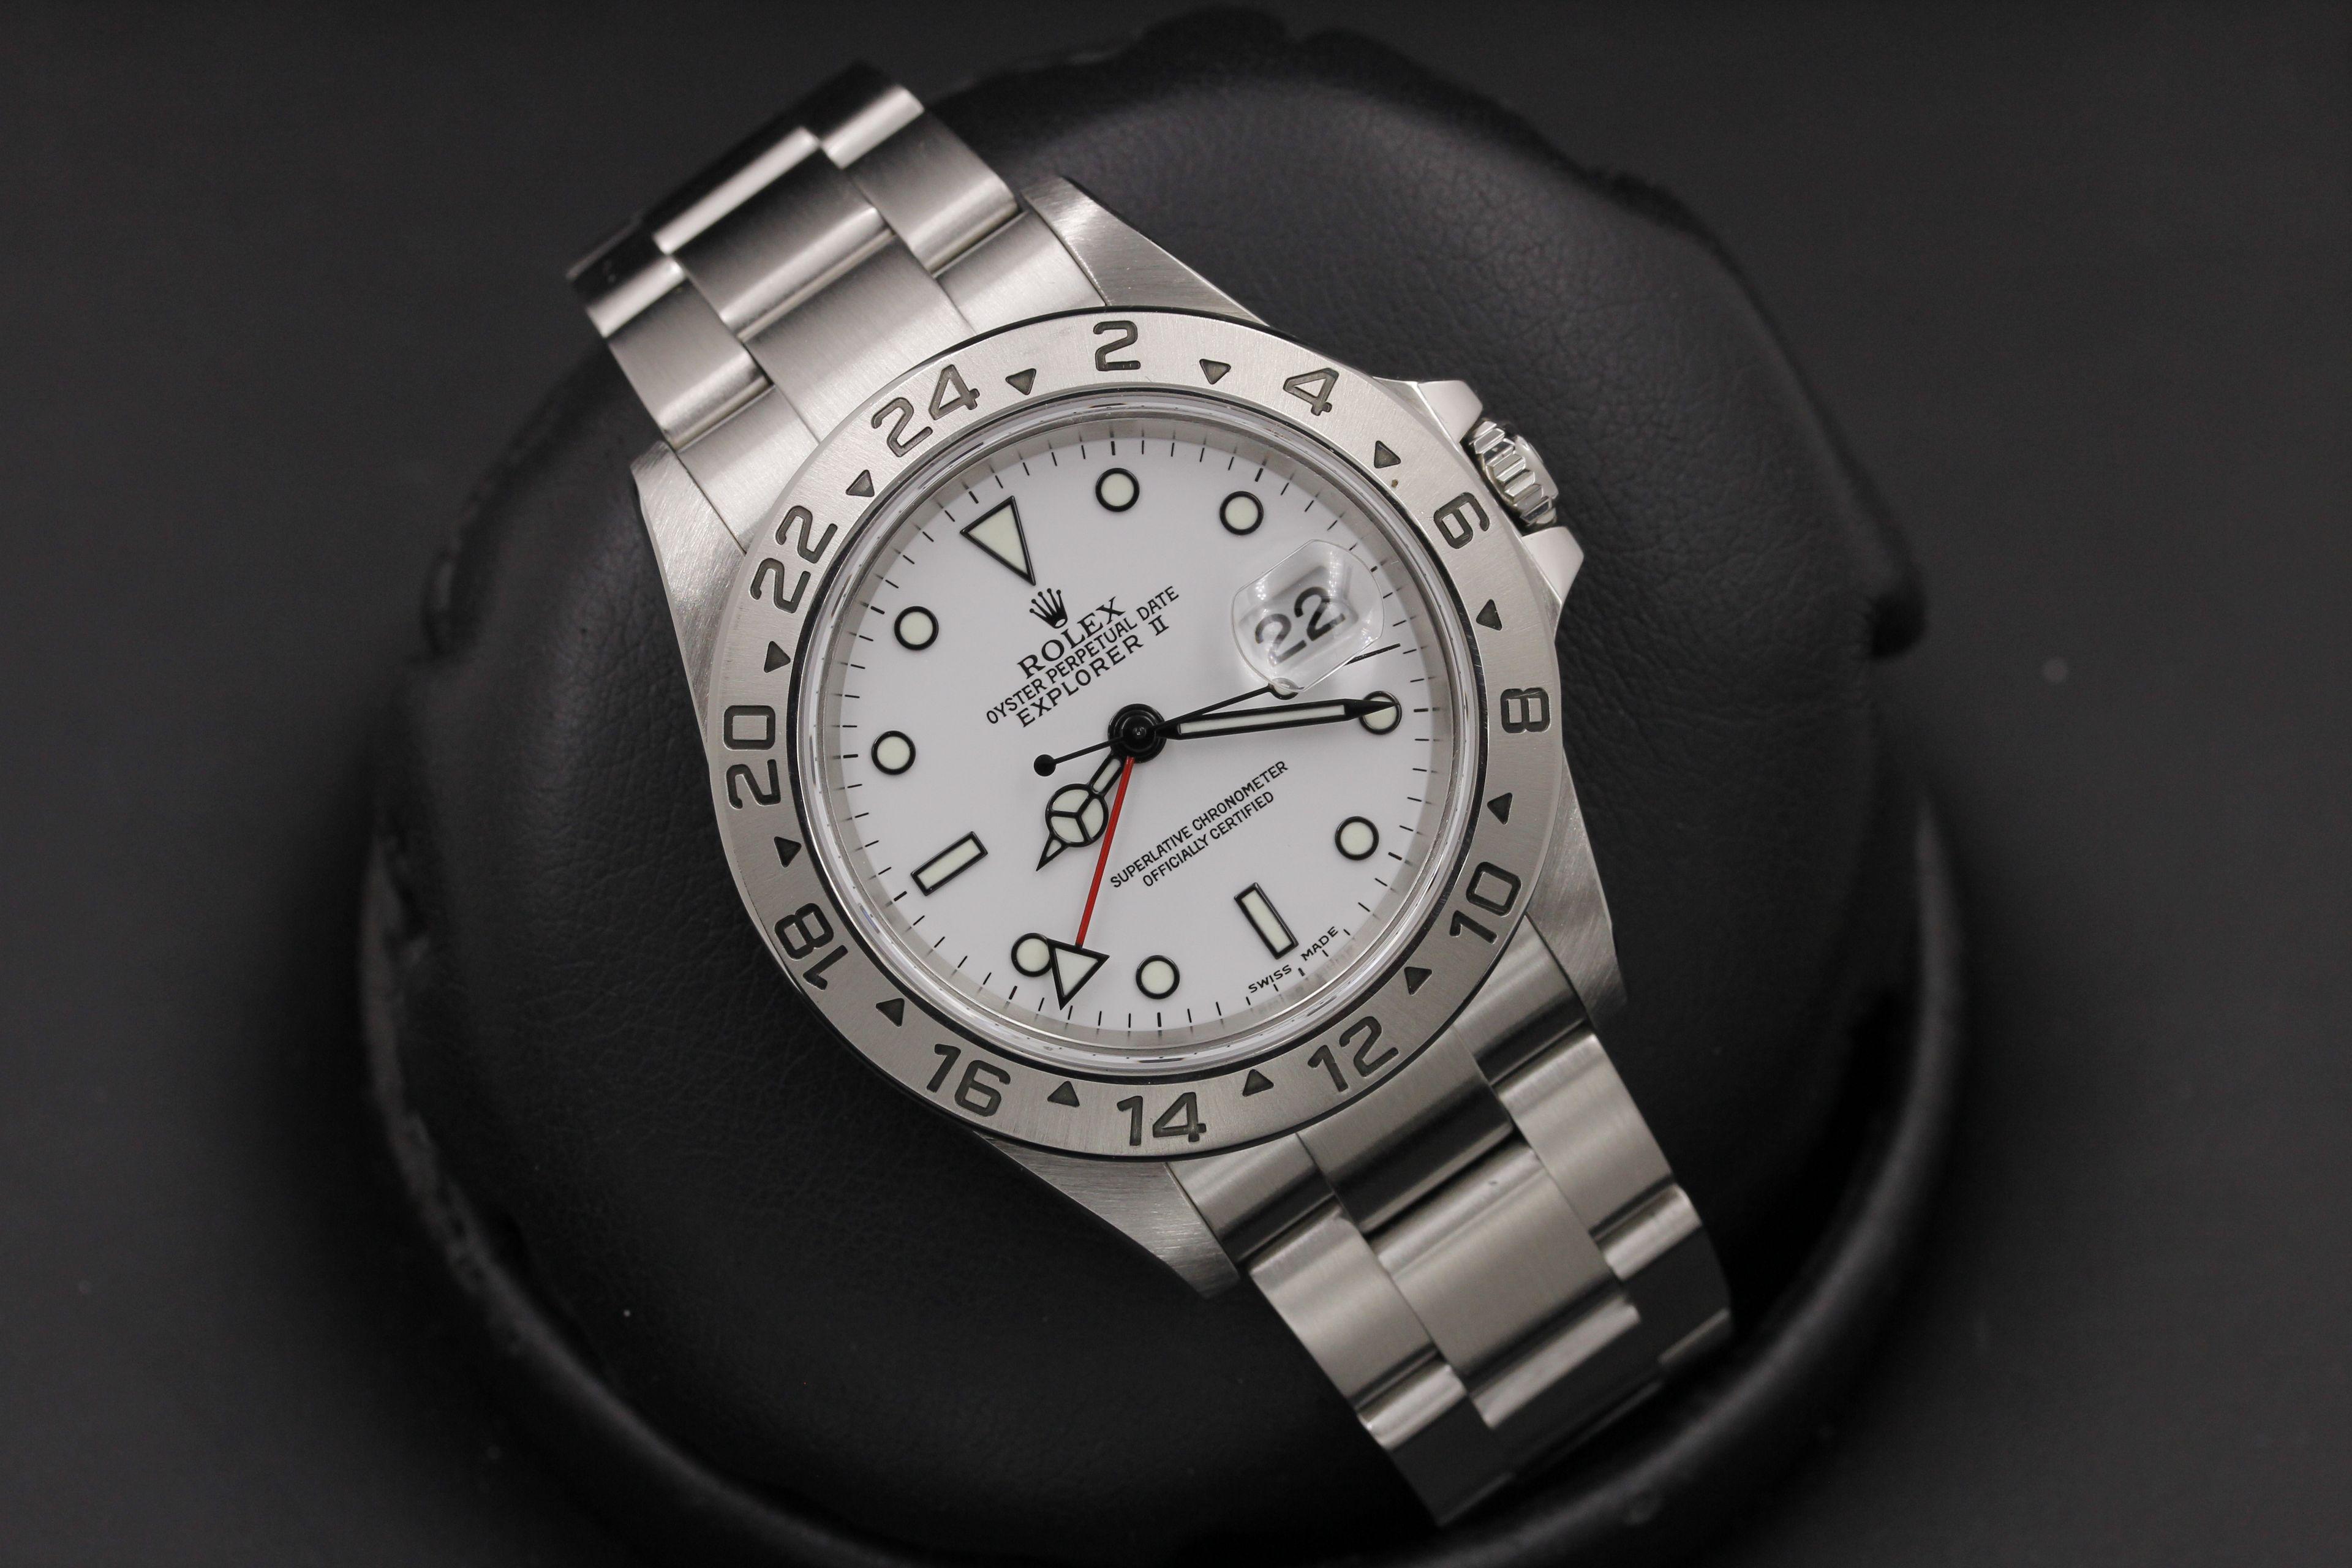 99db2fed129 Rolex Explorer II - 16570 - 40mm - White Dial - F Serial -